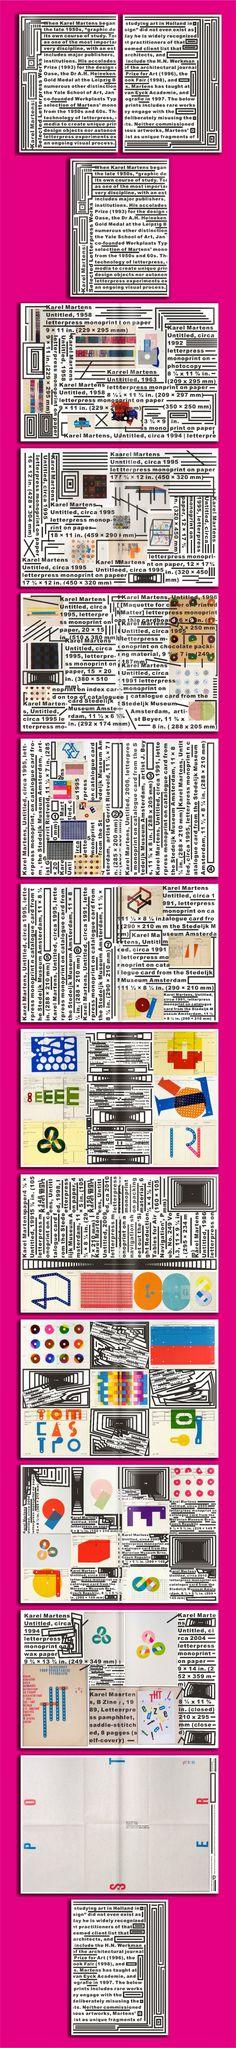 Karel Martens: Selected Letterpress Works - Jiyun Lou   Everything NewDesign